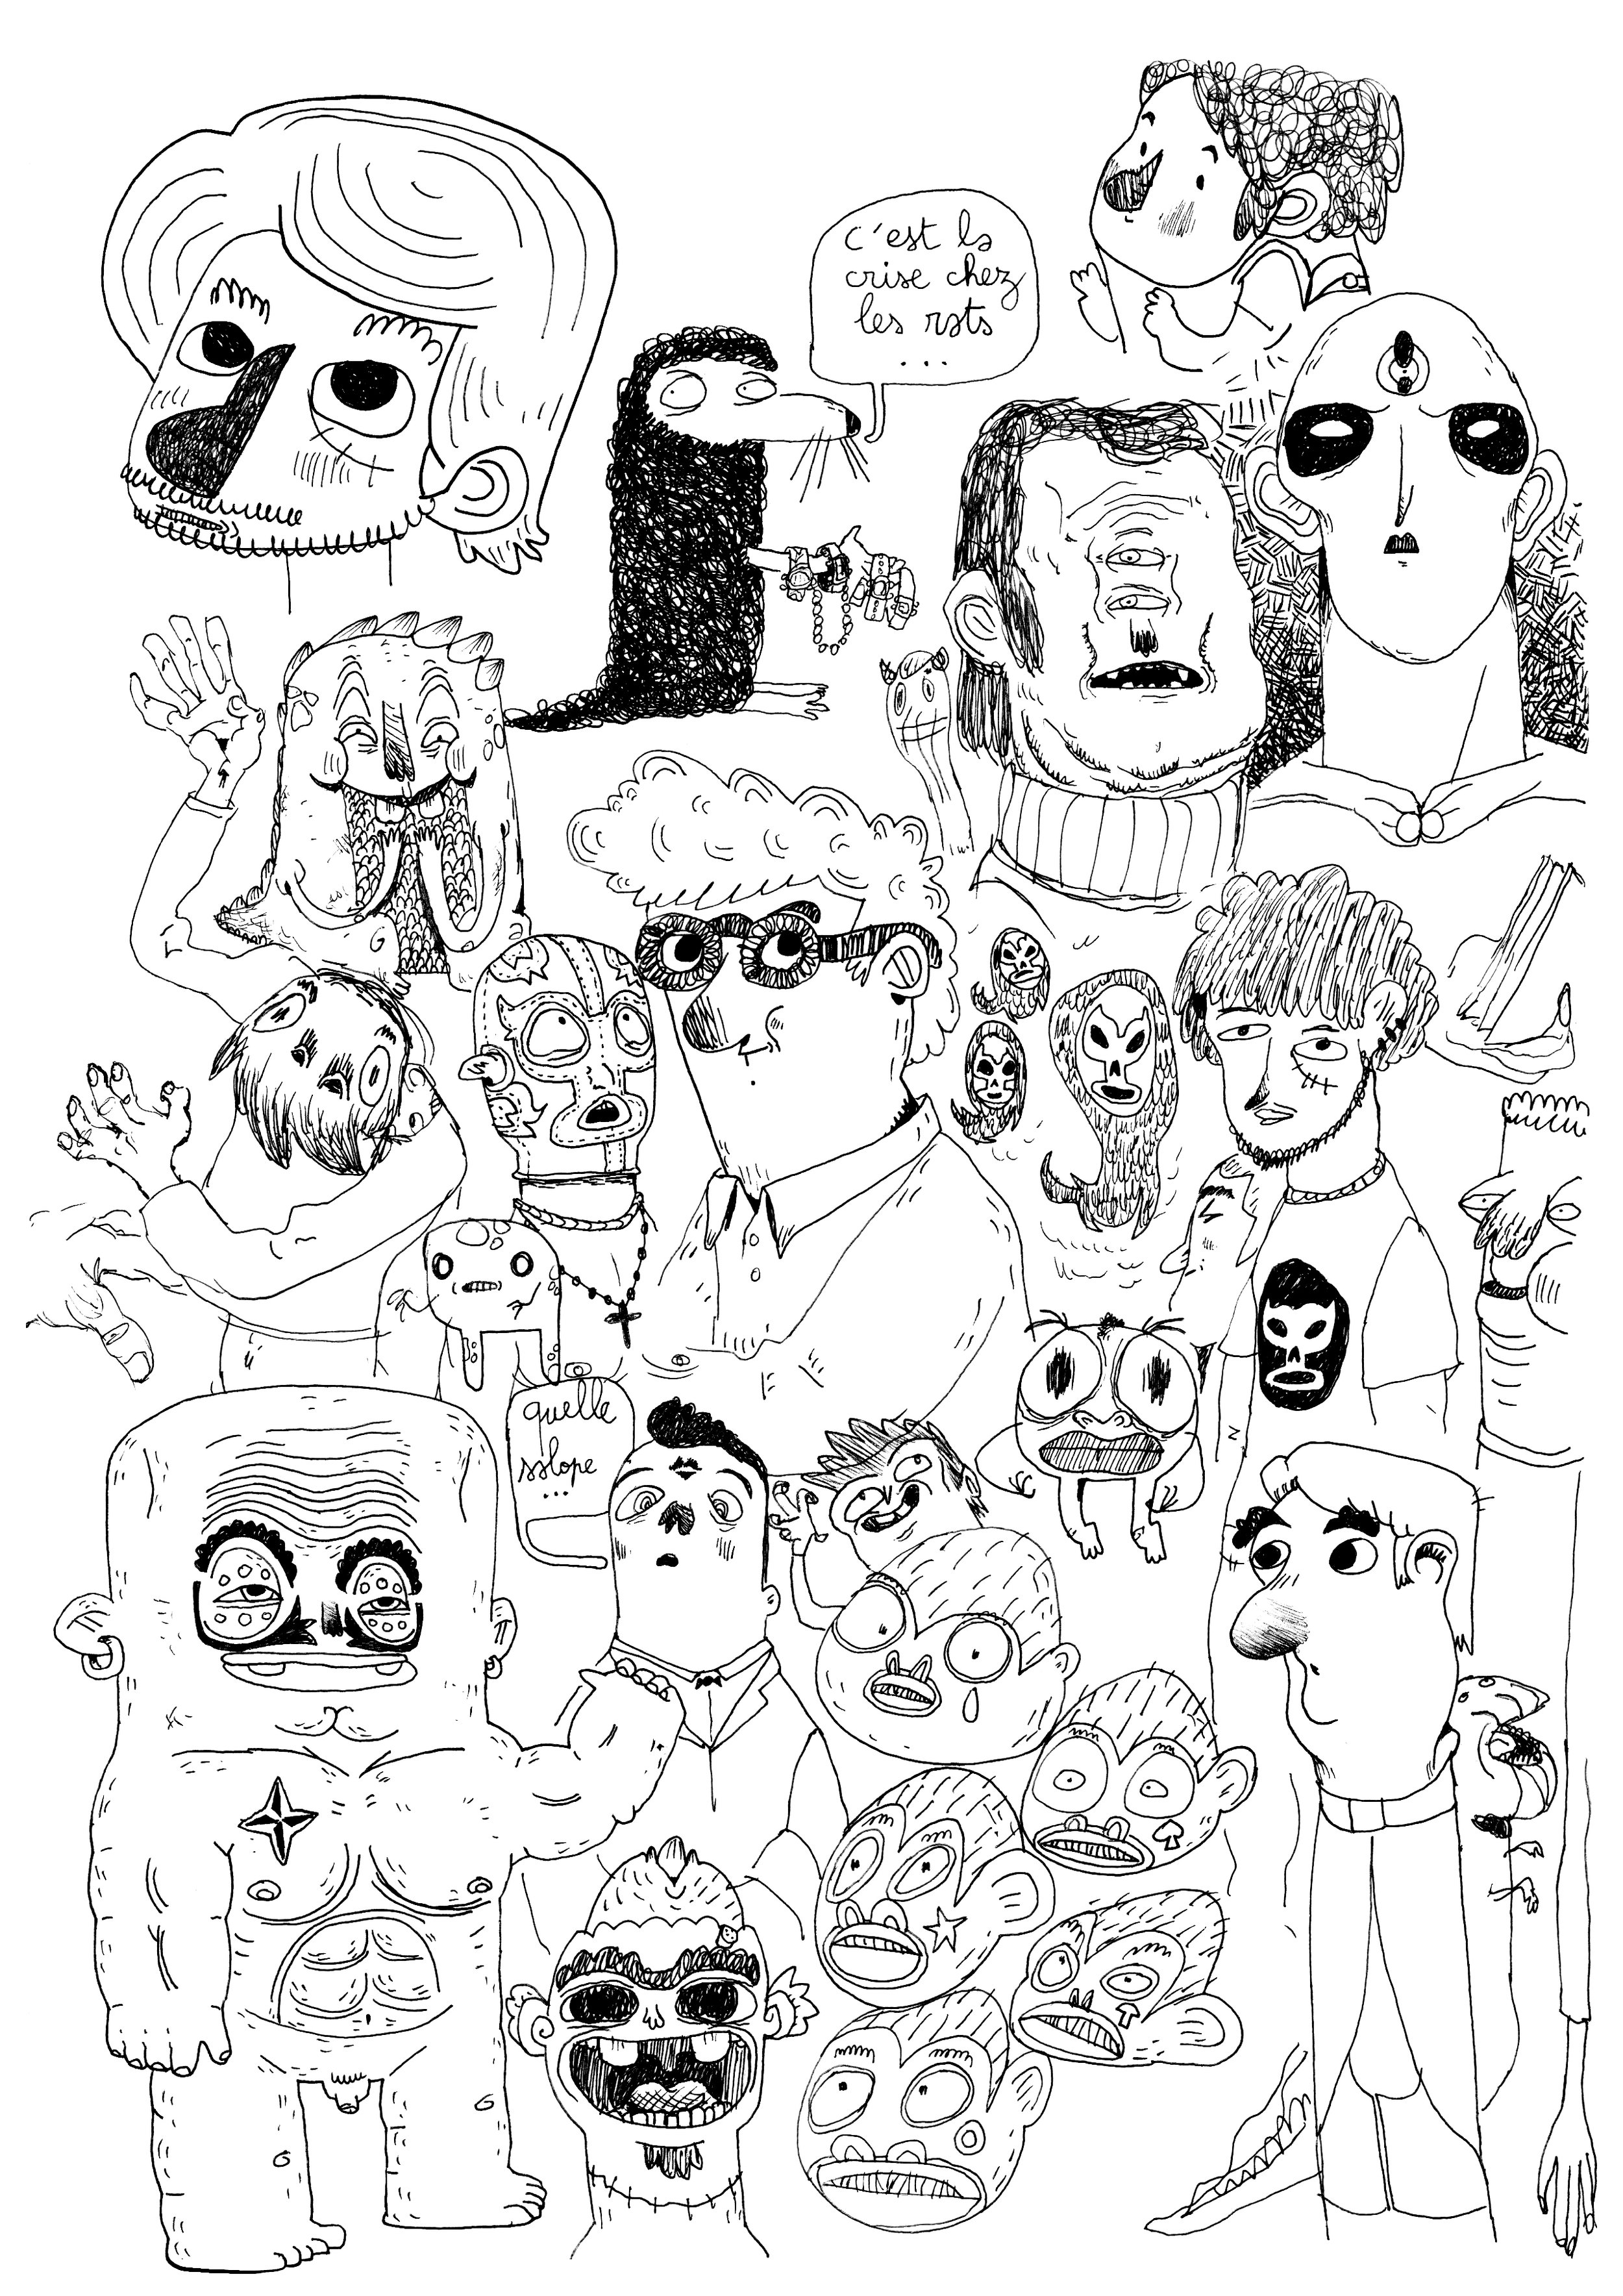 Pascal_Zaffiro_Doodle_27.jpg